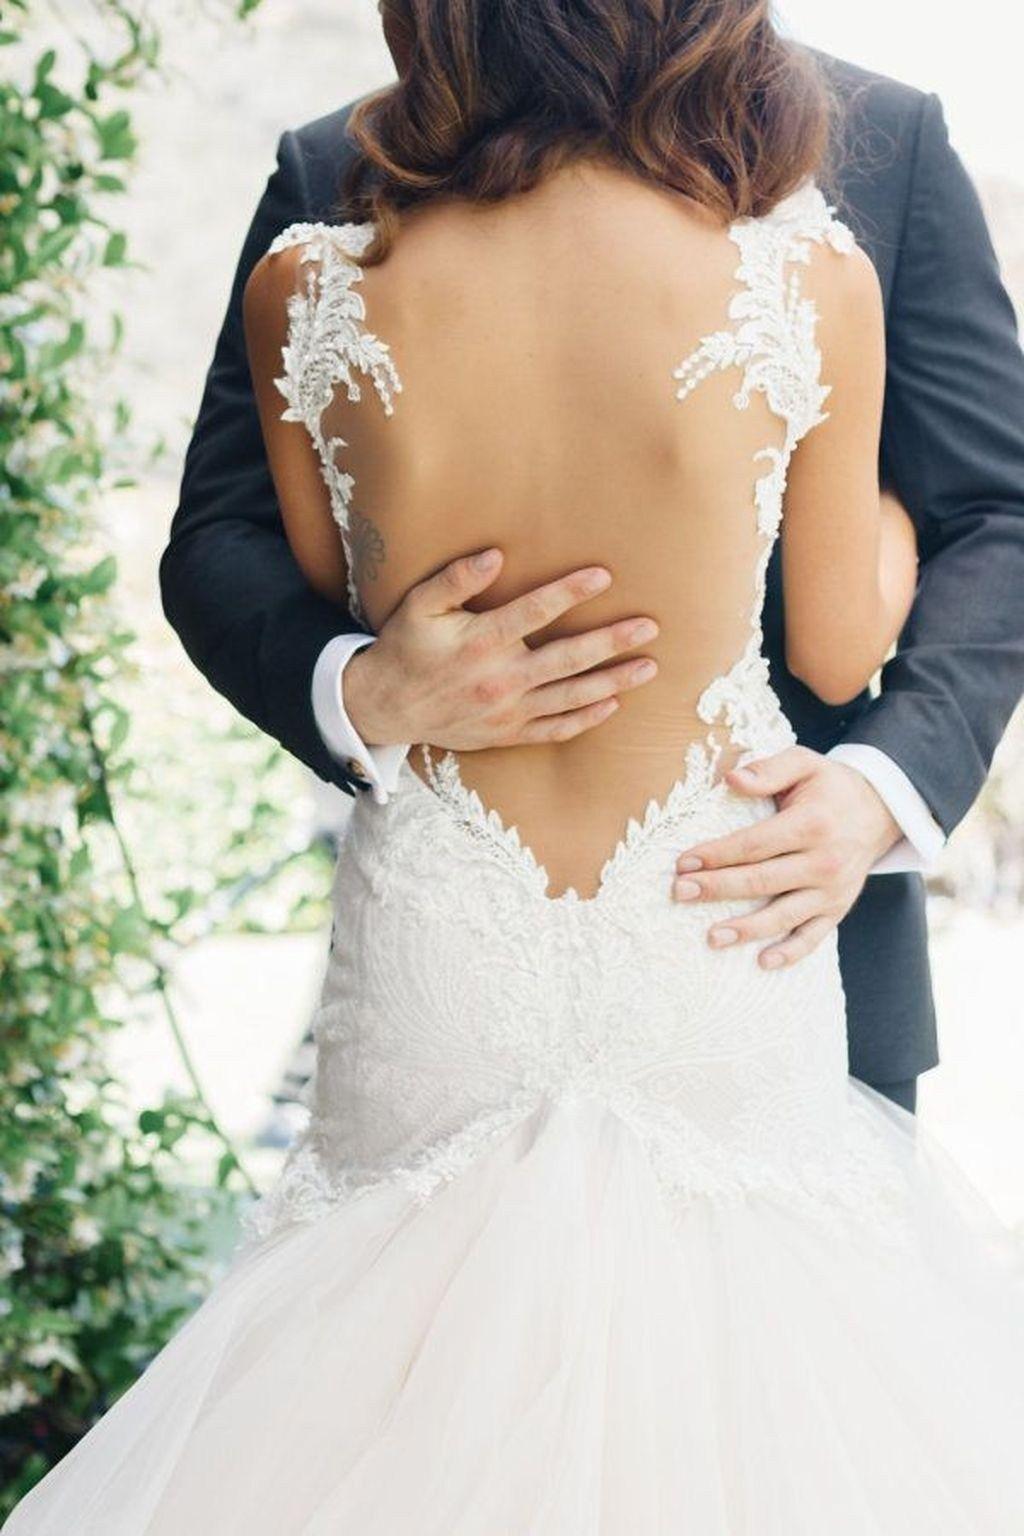 low cut wedding dress bra